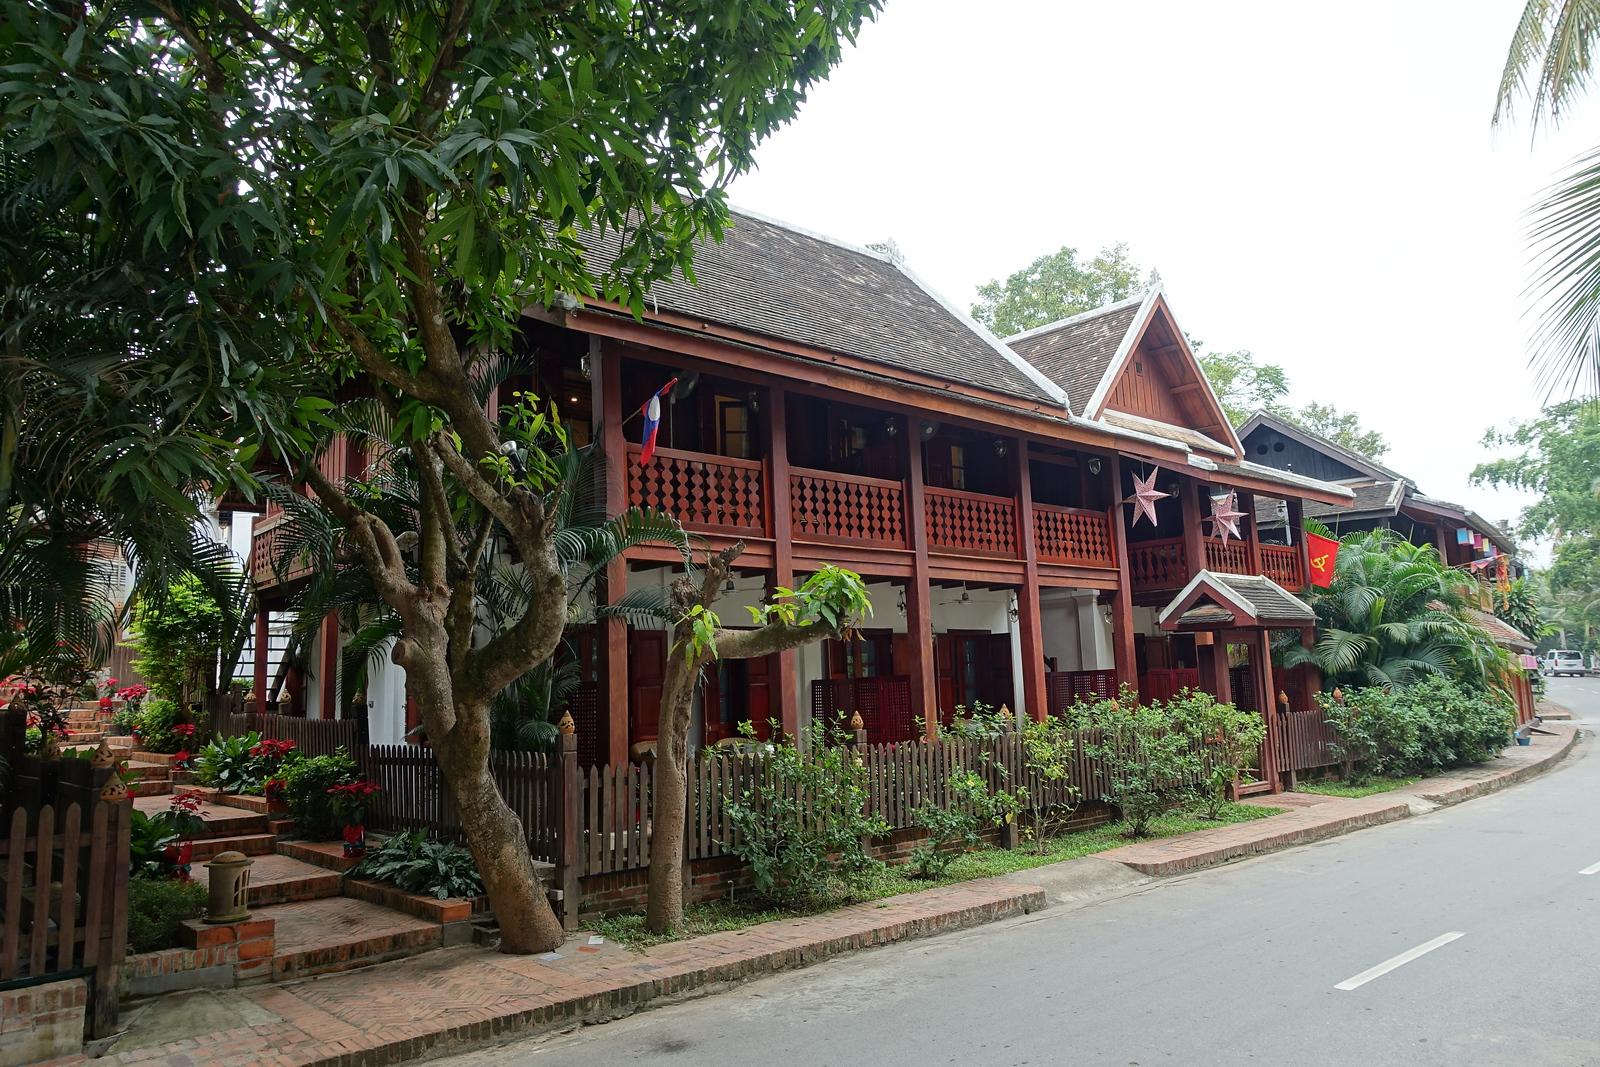 Luang Prabang – Mekong Riverview Hotel